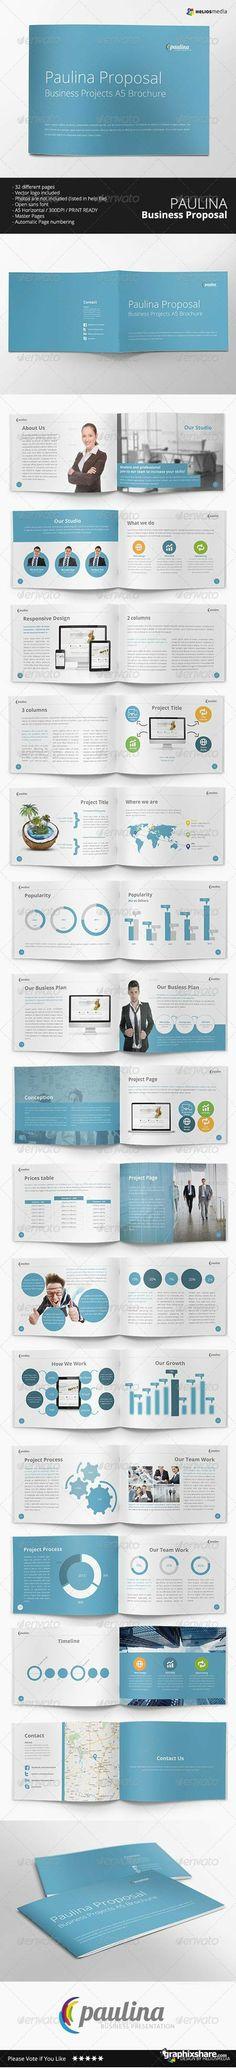 Minimal Business Proposal Business proposal, Marketing proposal - business proposal software free download